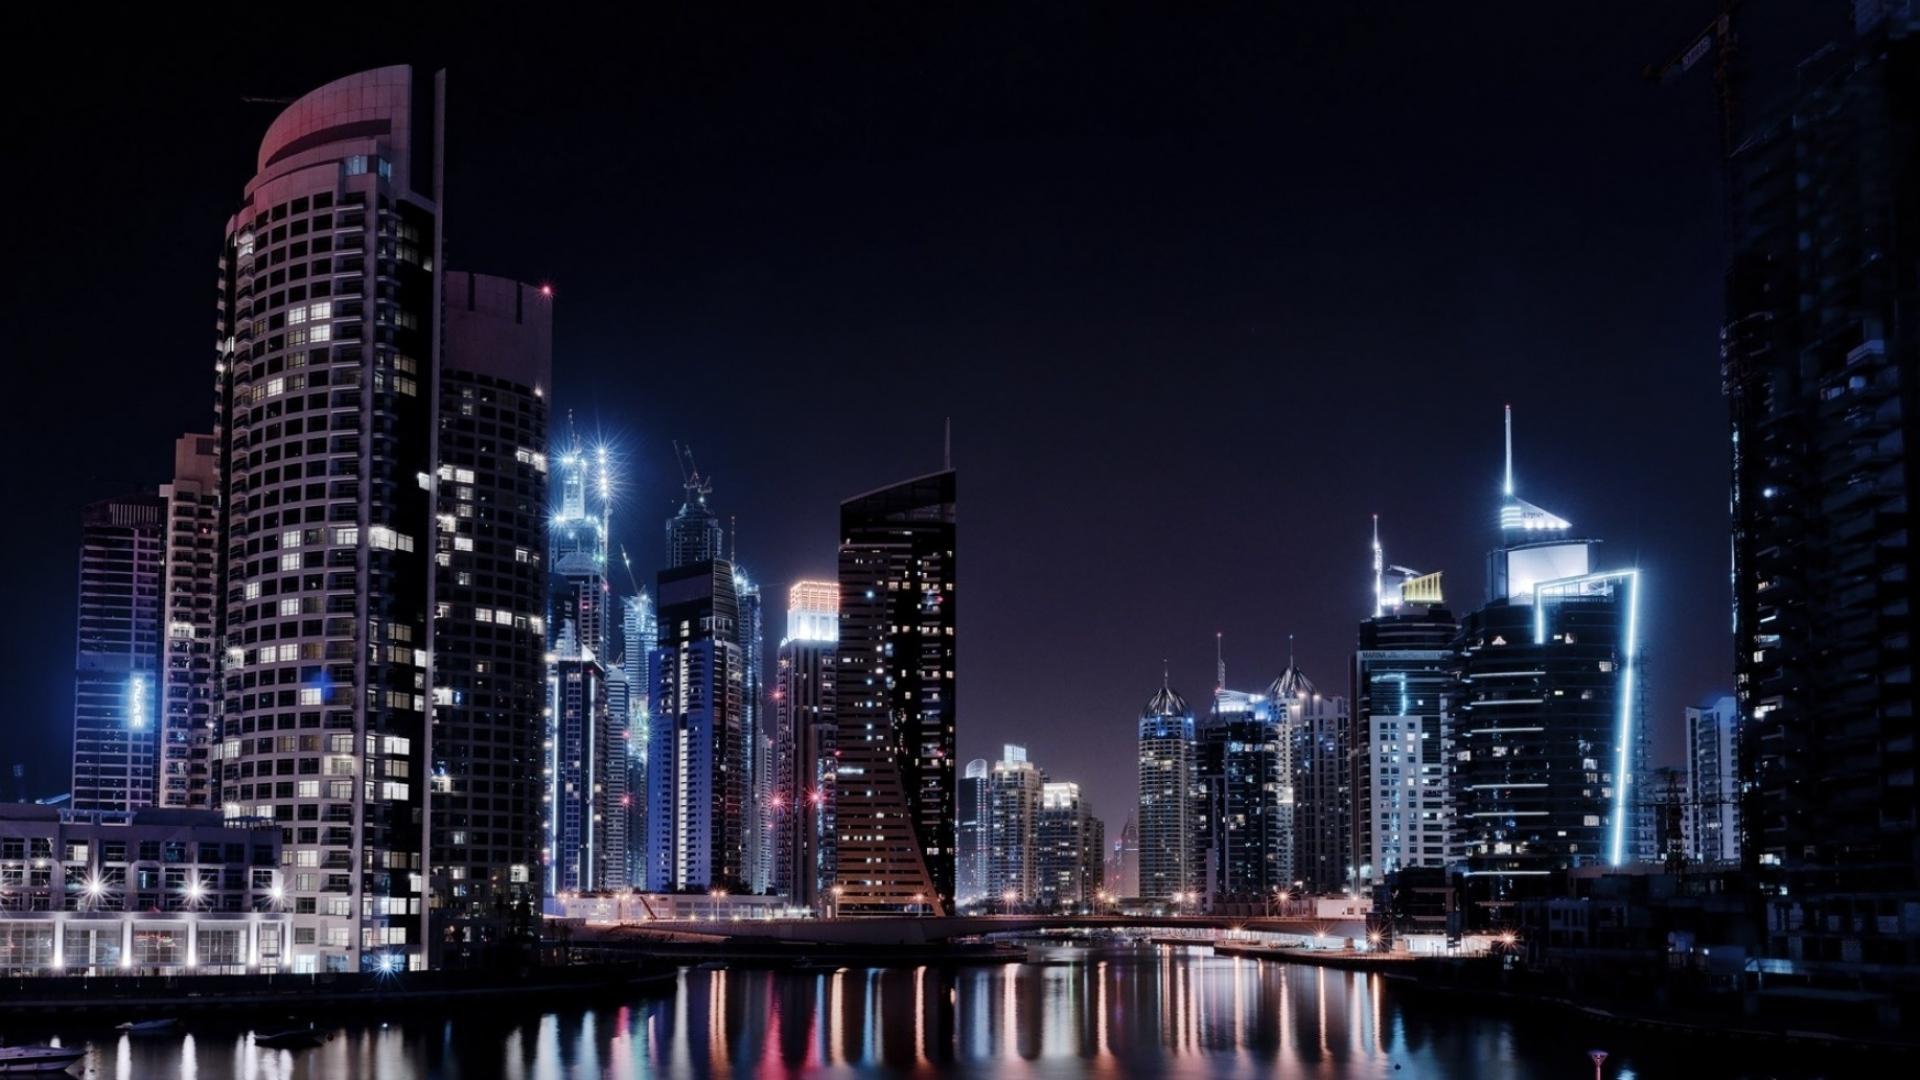 Simple Wallpaper Night Dubai - dubai_city_lights_river_night_59138_1920x1080  You Should Have-449080.jpg